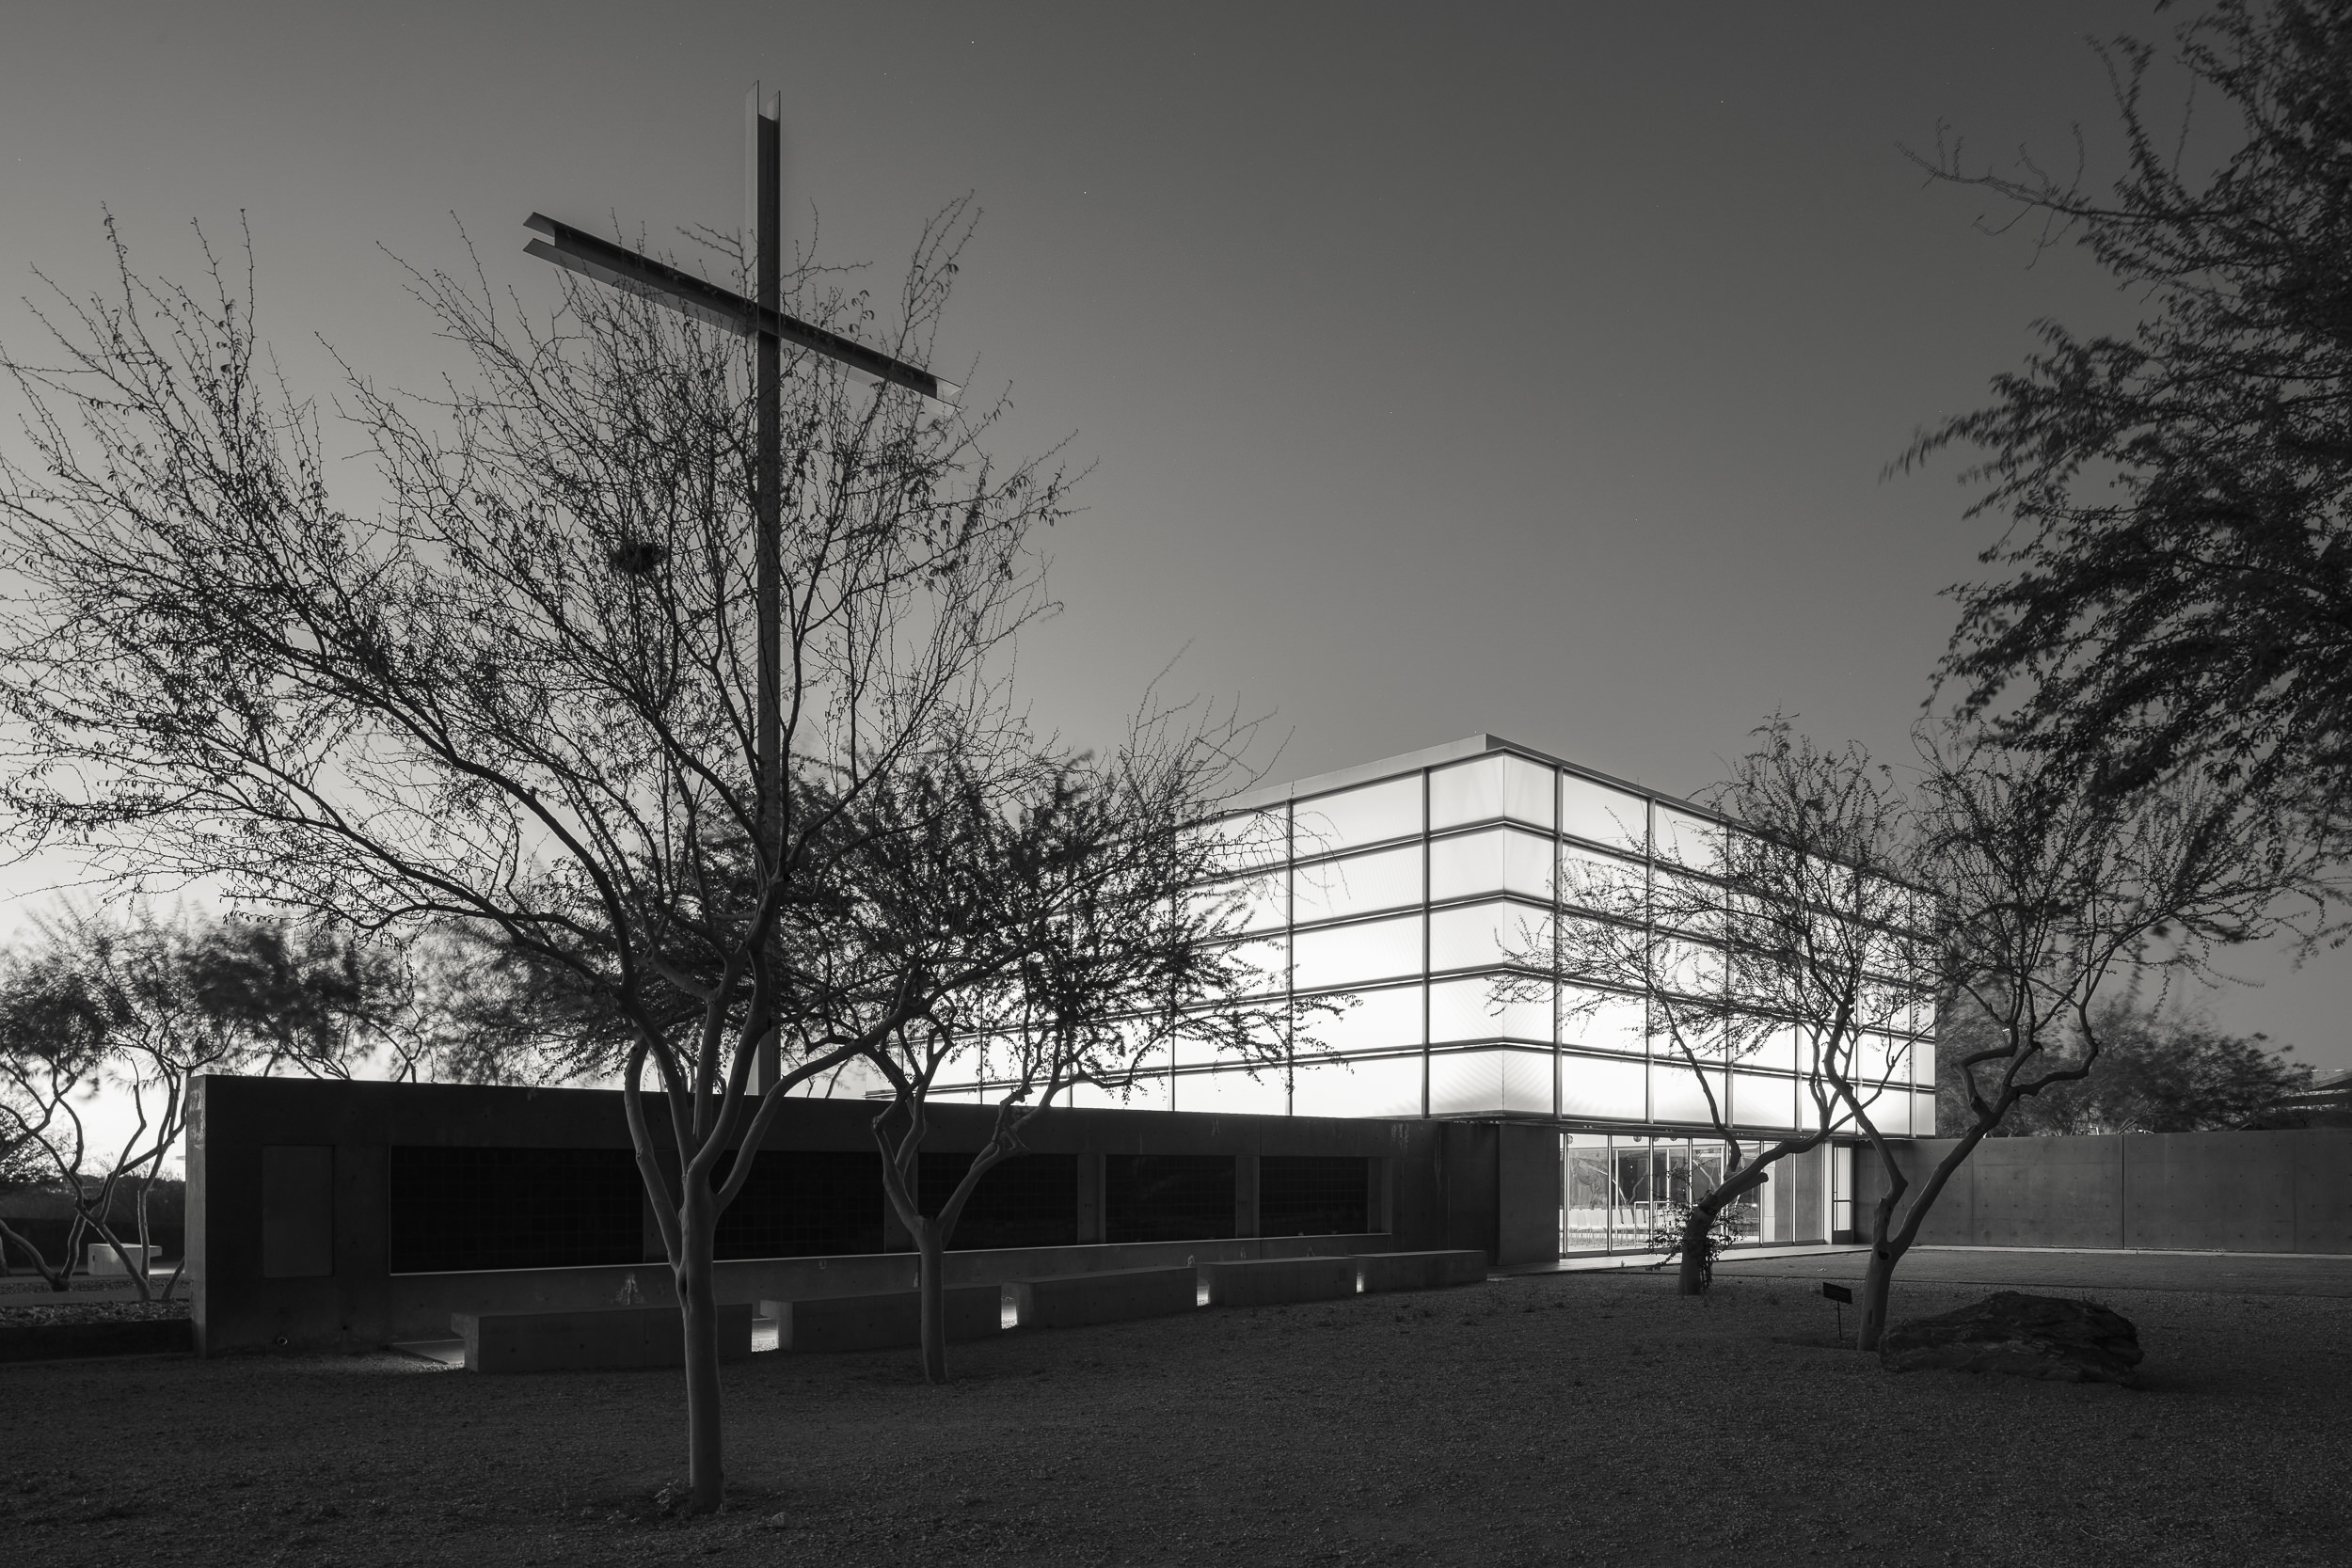 Prayer Pavilion of Light